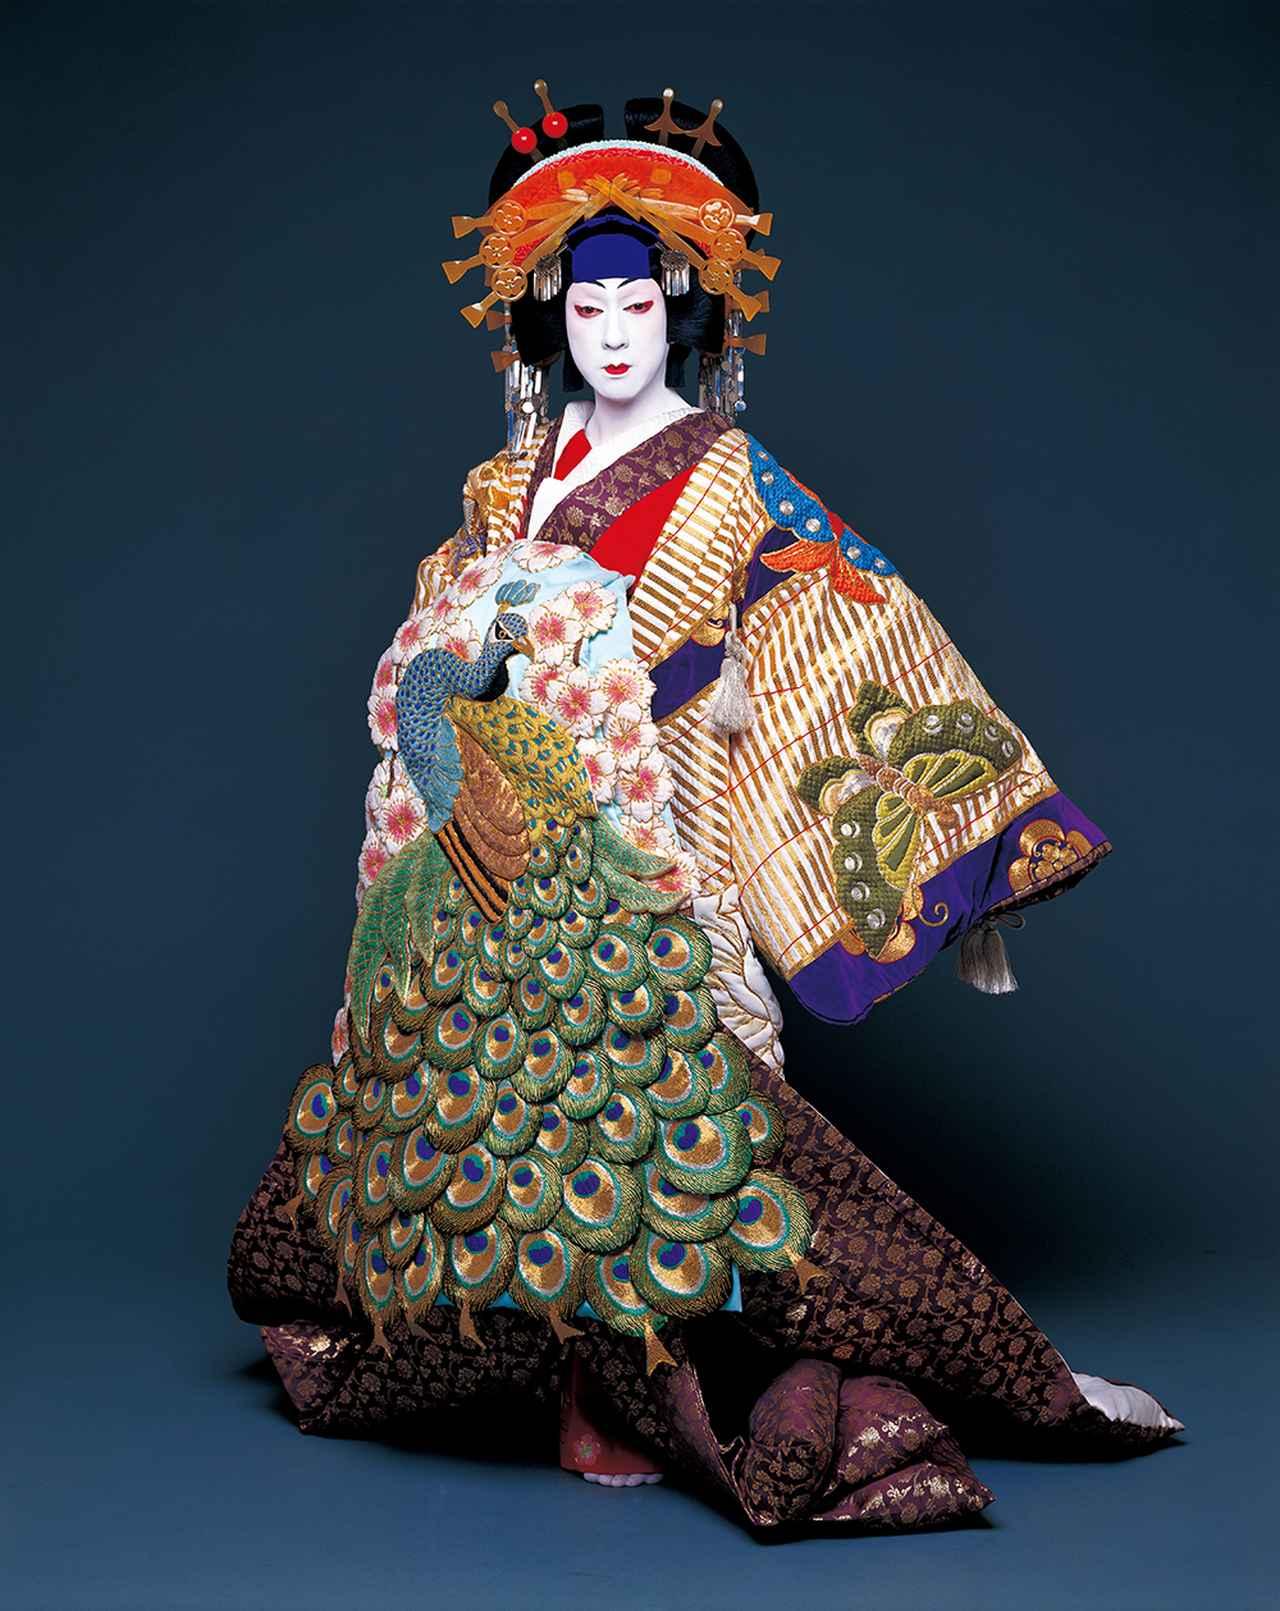 Images : 1番目の画像 - 「次世代へ芸を伝承しながら 革新をもためらわない。 坂東玉三郎が今、舞台に託す思い」のアルバム - T JAPAN:The New York Times Style Magazine 公式サイト